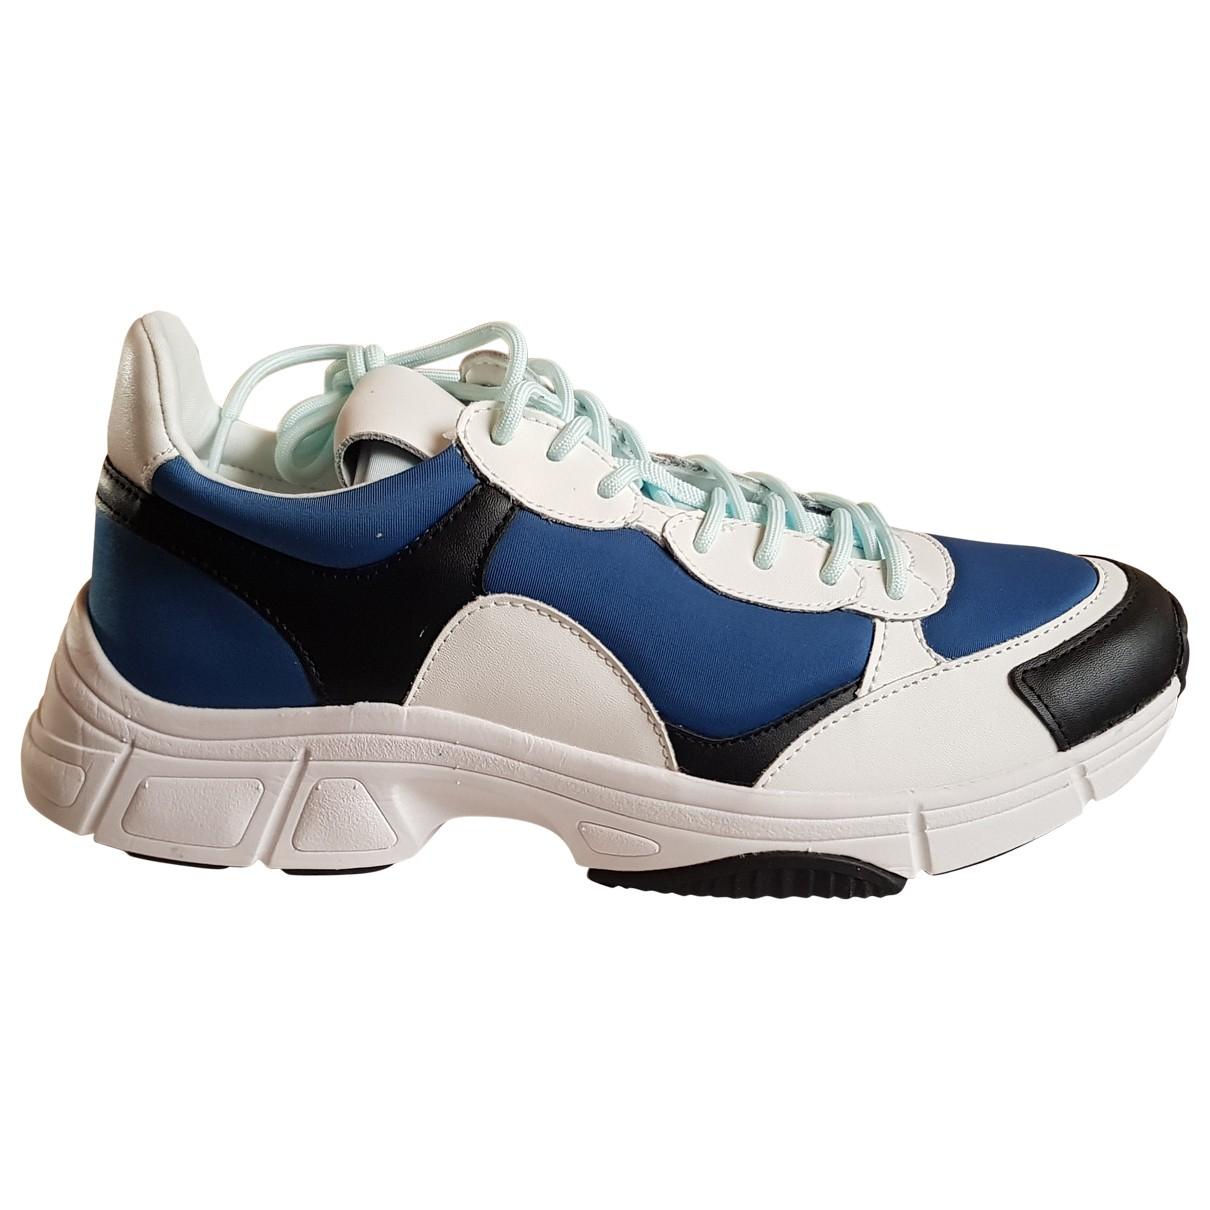 Calvin Klein - Baskets   pour homme en cuir - bleu